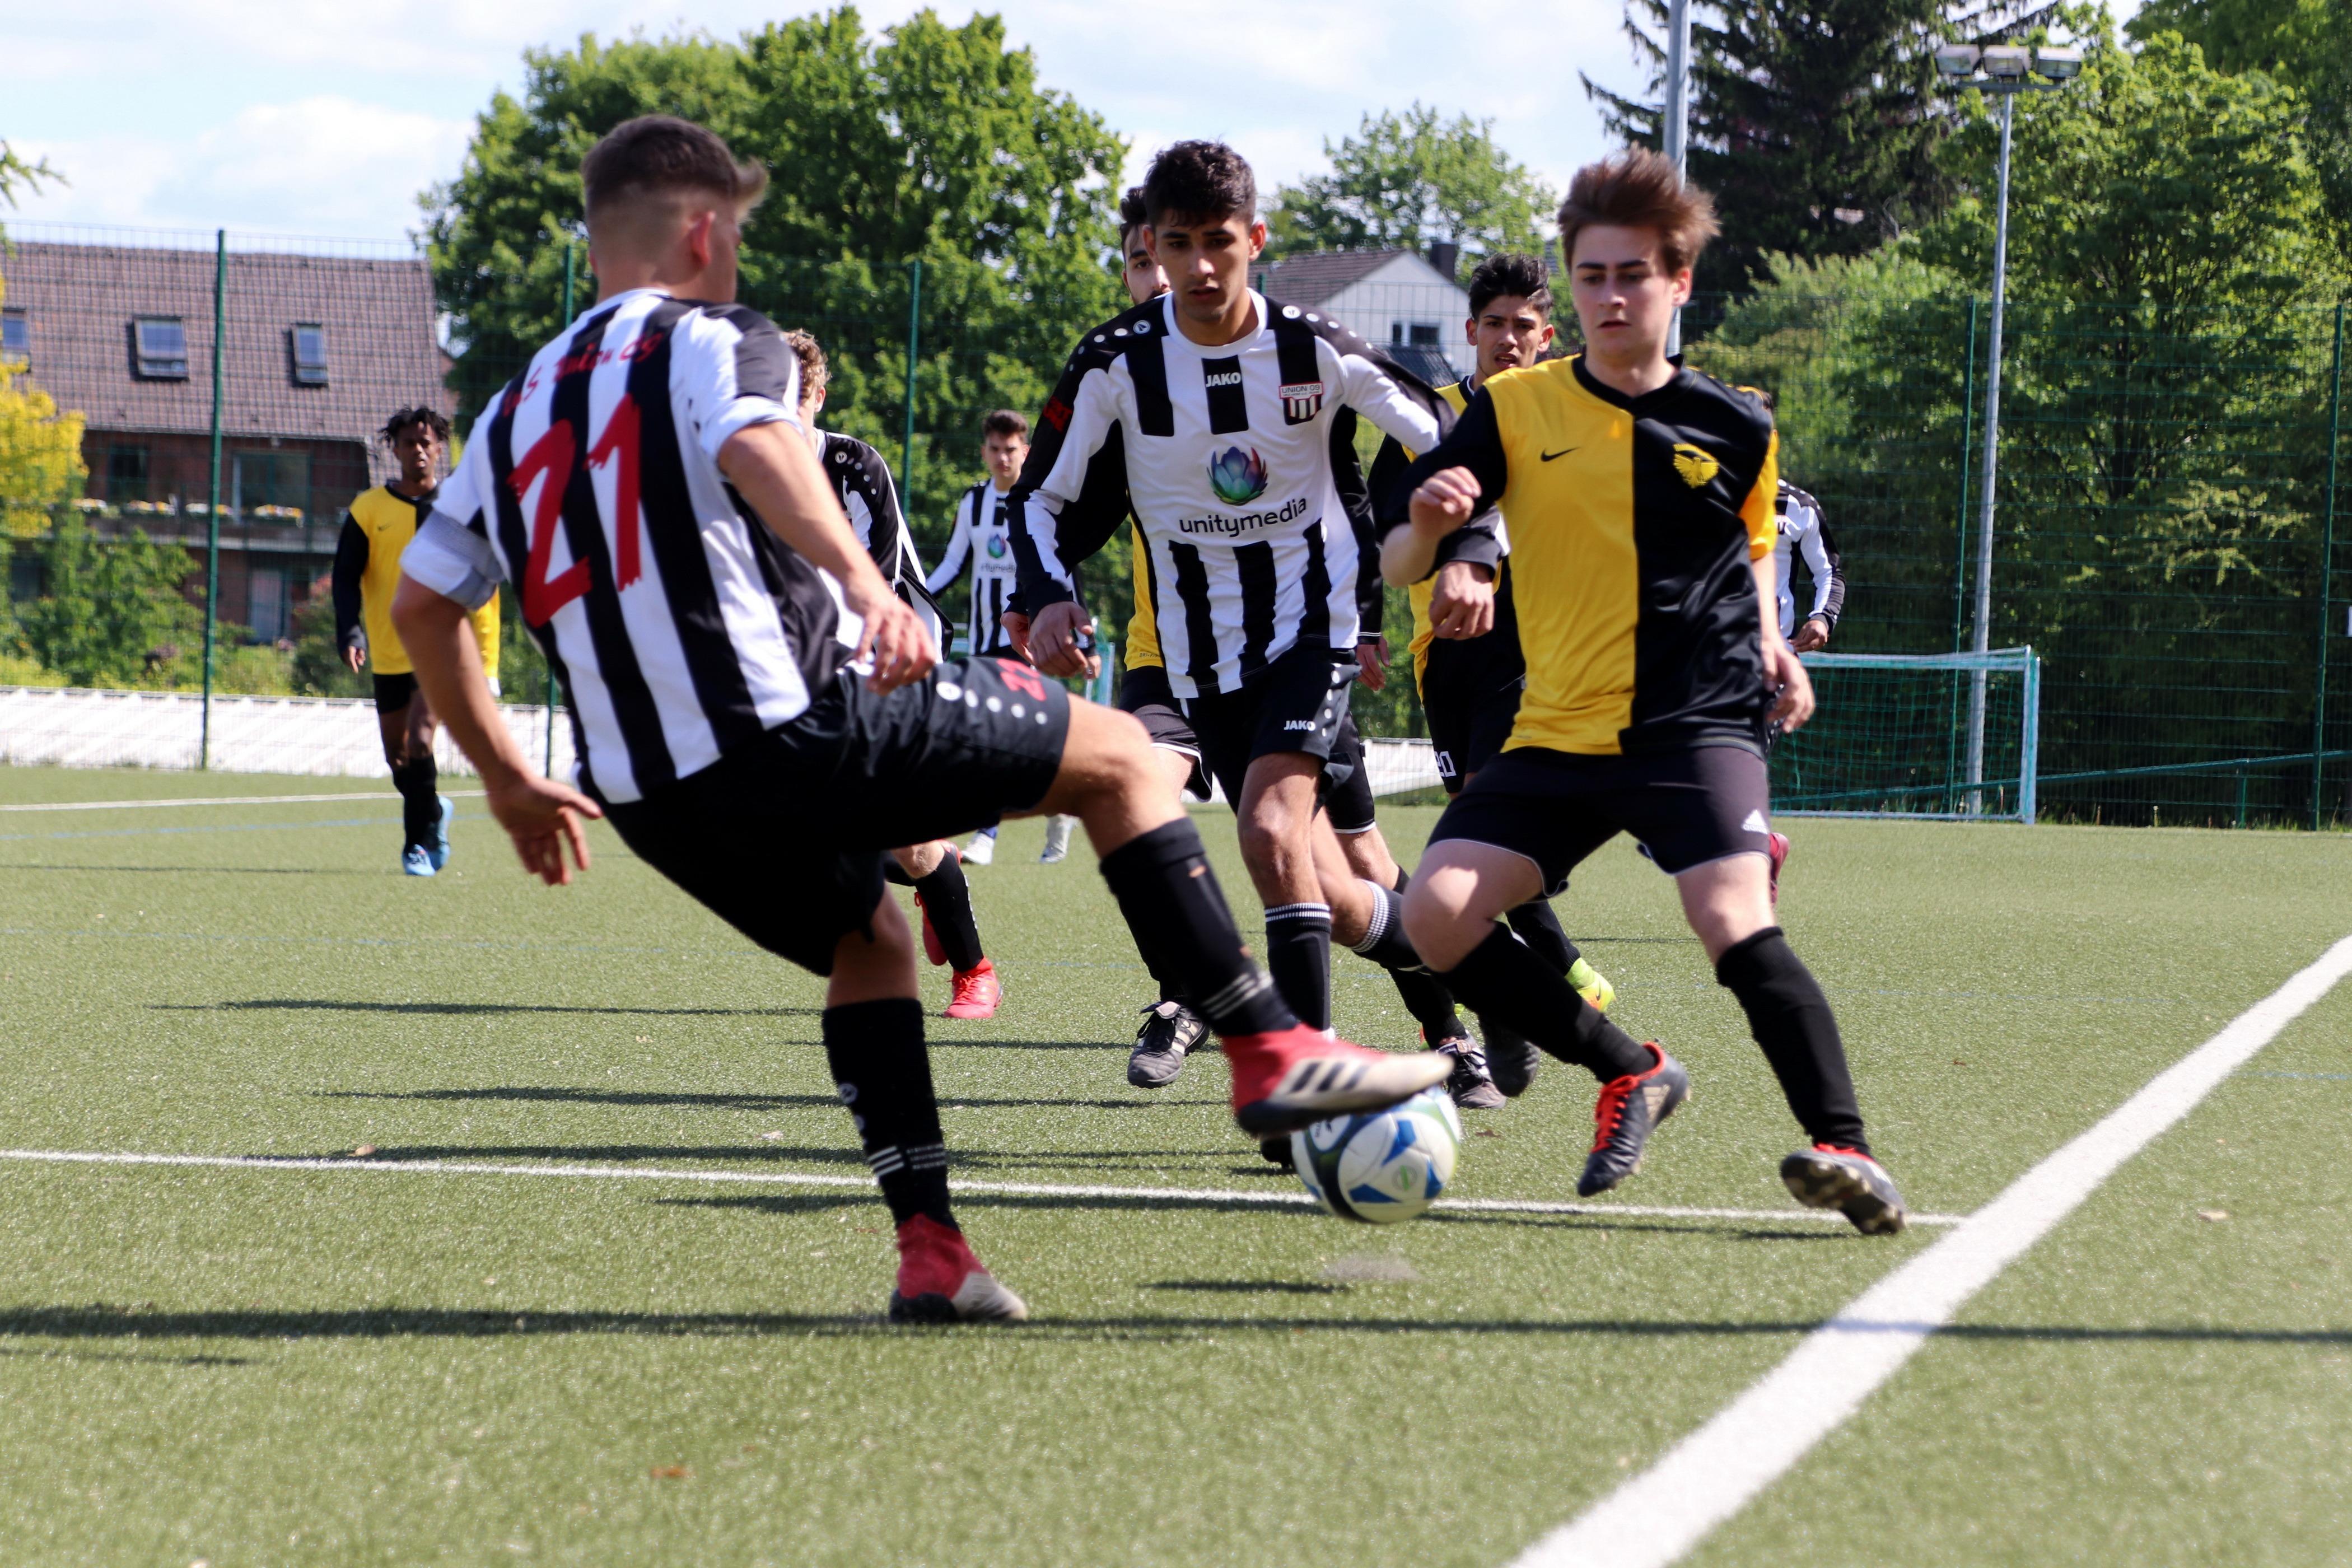 A1-Jugend – dreht nach toller Teamleistung das Spiel